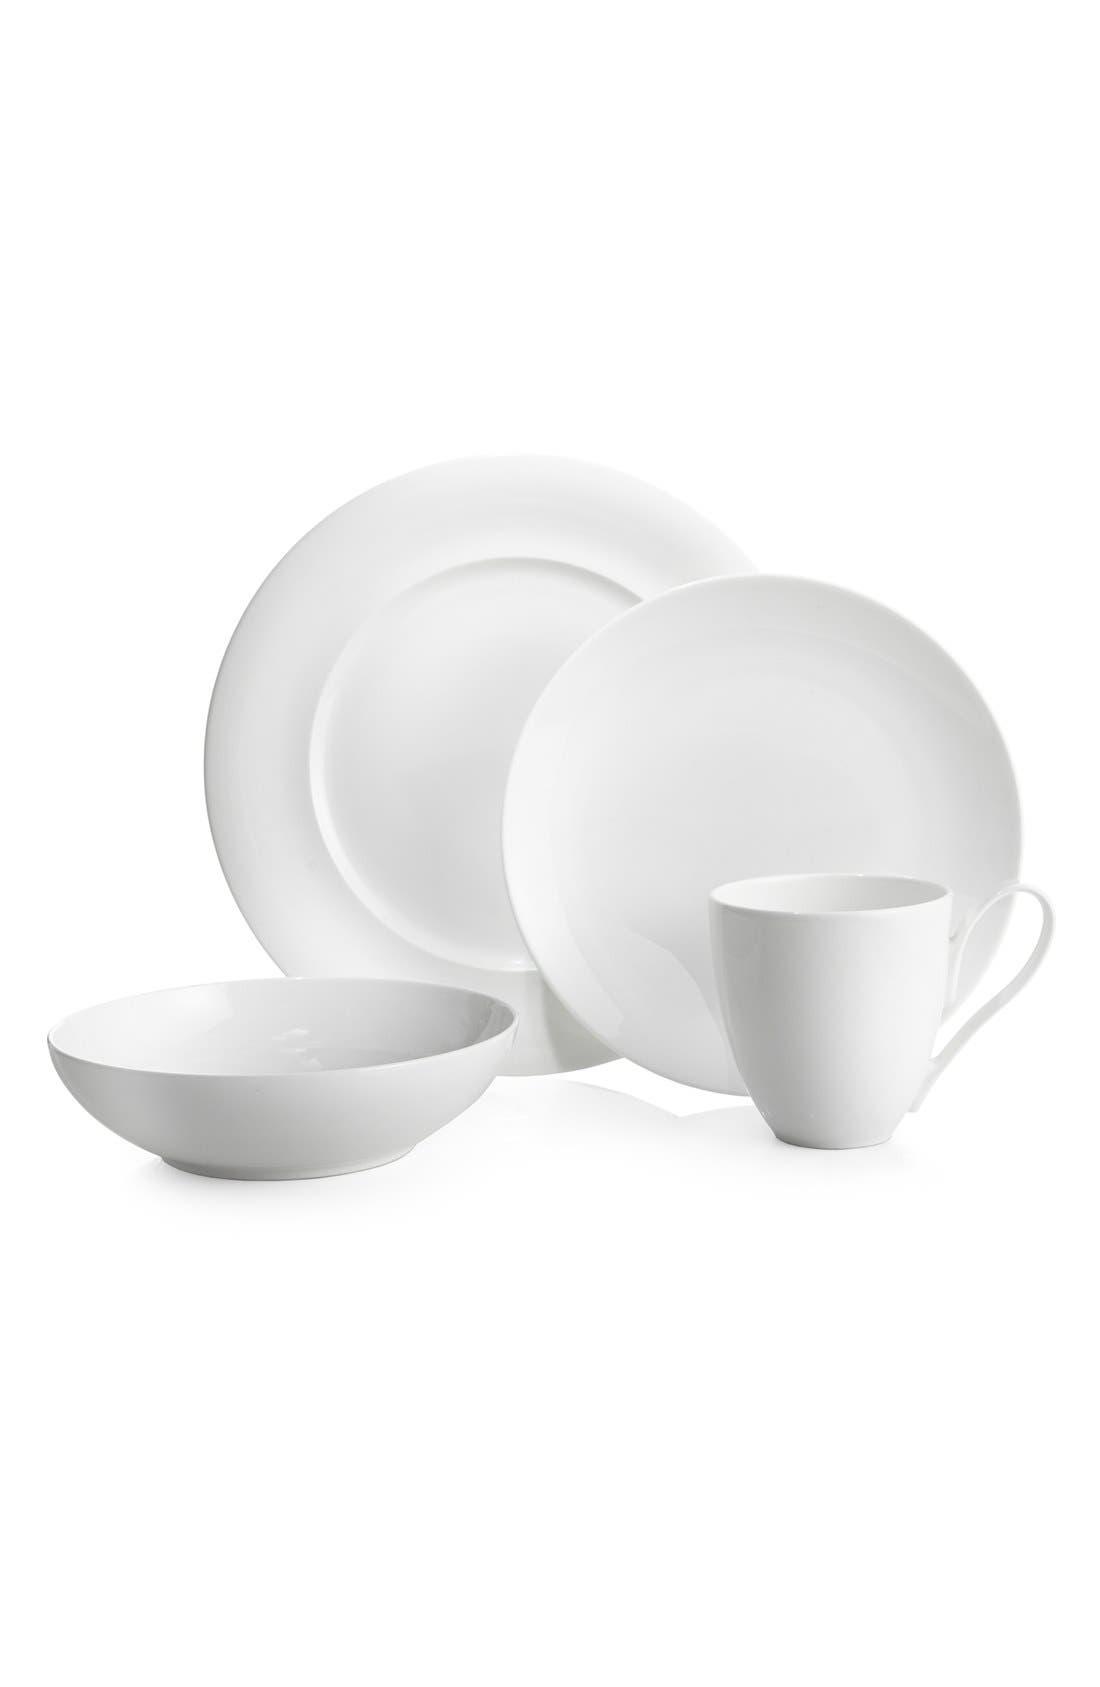 sc 1 st  Nordstrom & Dinnerware: Dishes Plates u0026 Bowls | Nordstrom